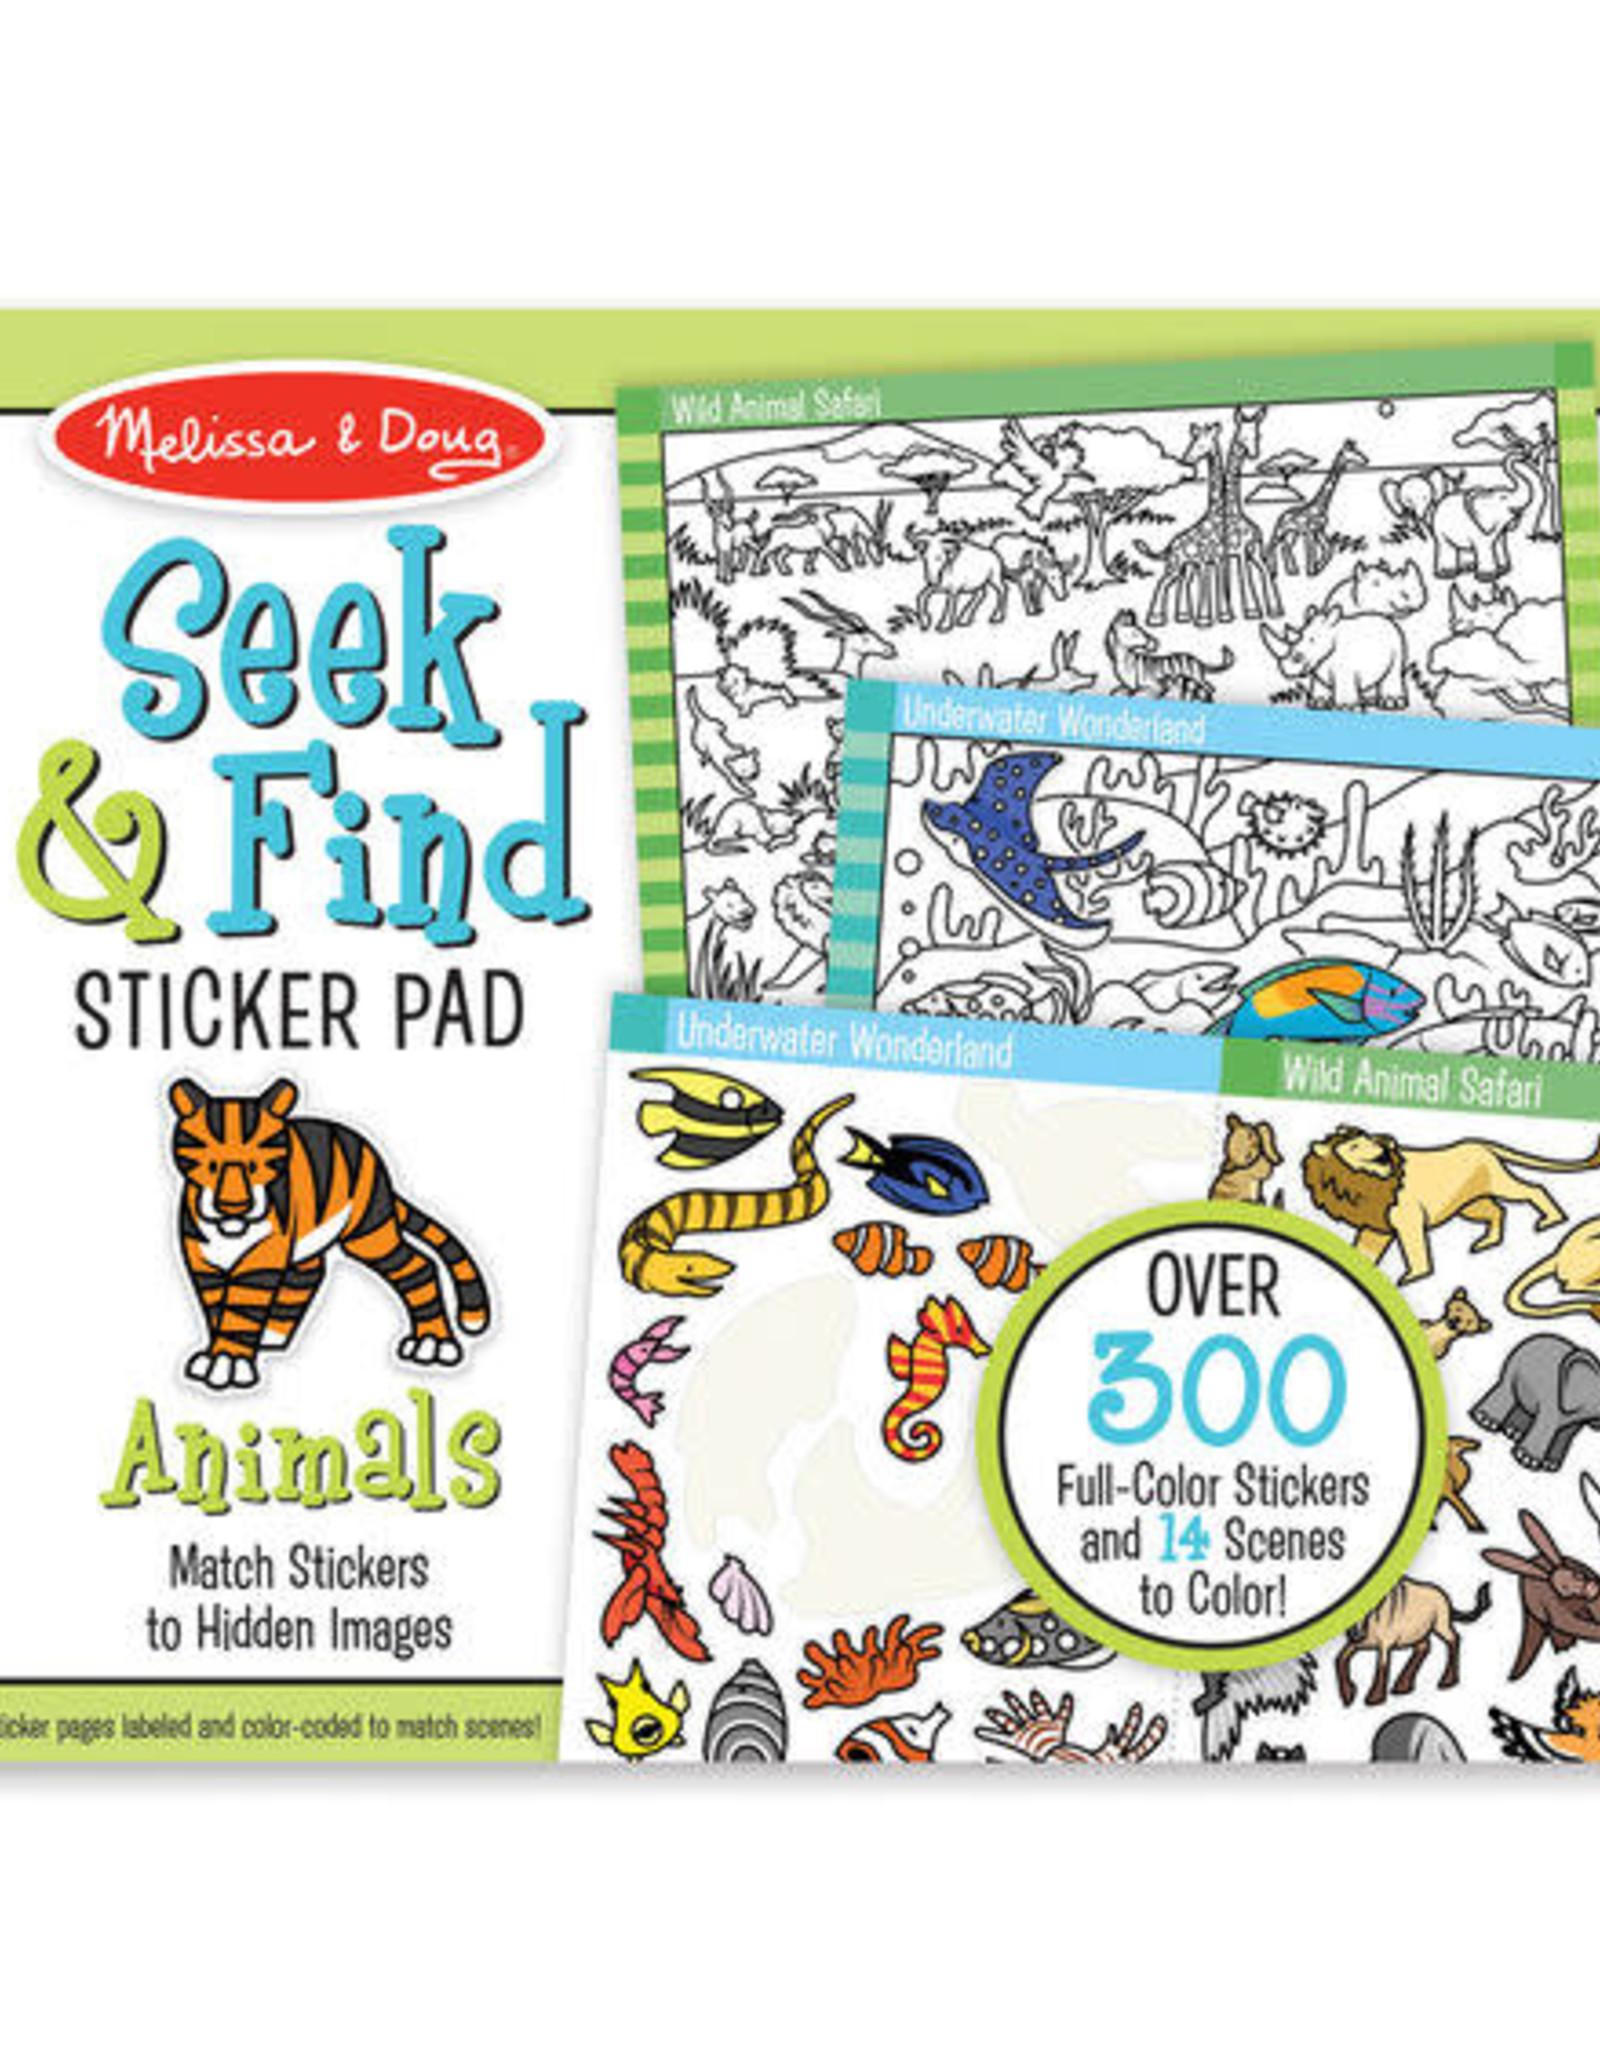 Melissa & Doug MD Seek & Find Sticker Pad Animals